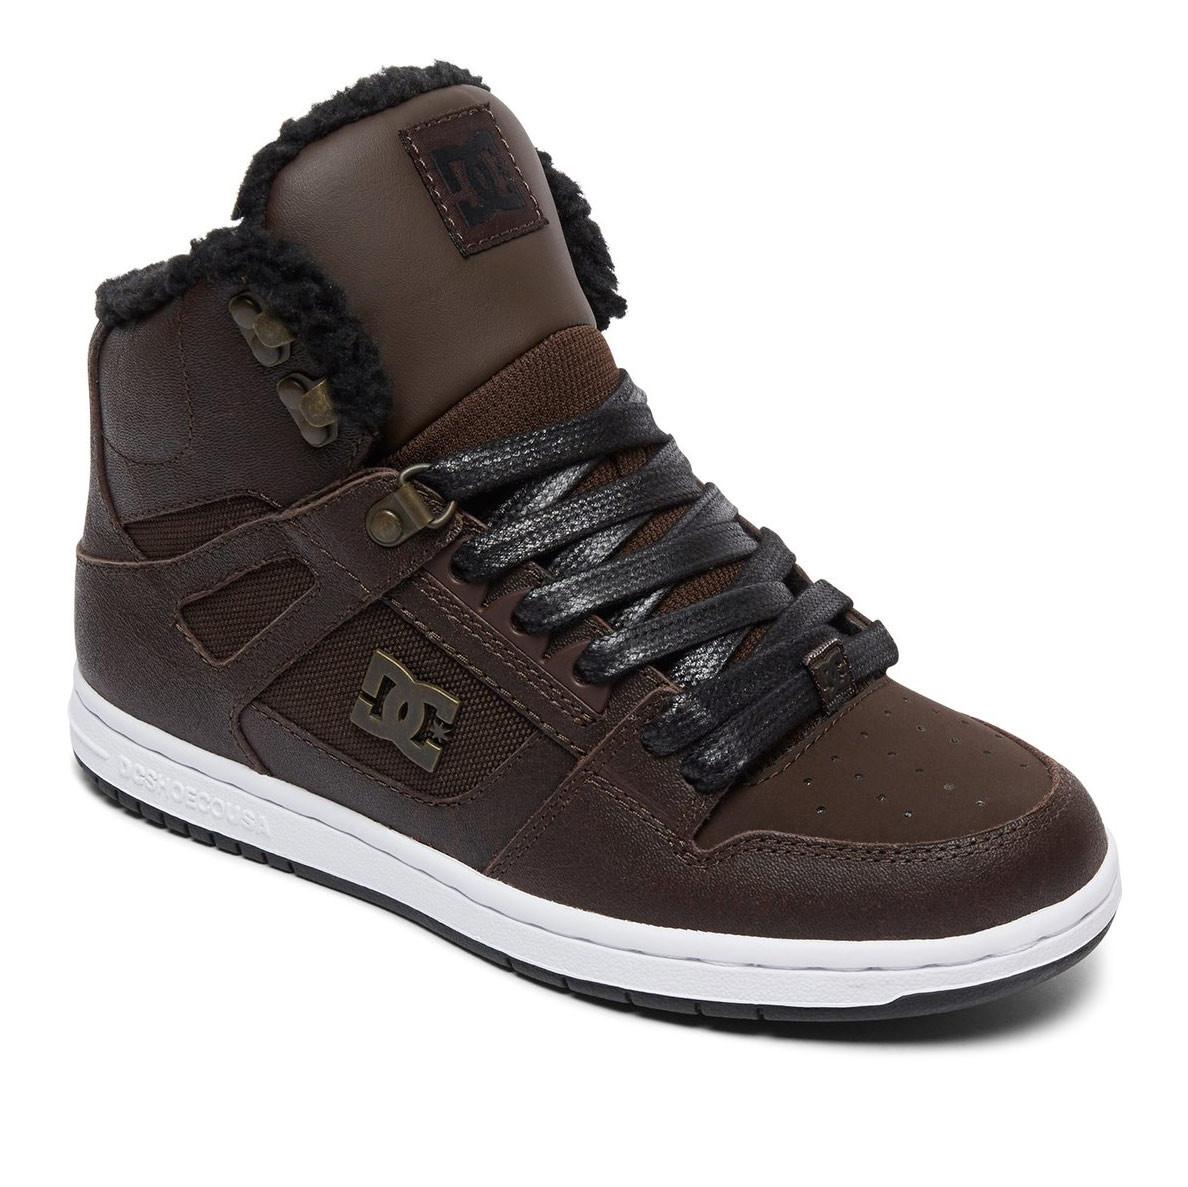 Zimní boty DC Rebound High Wnt Wms brown/chocolate